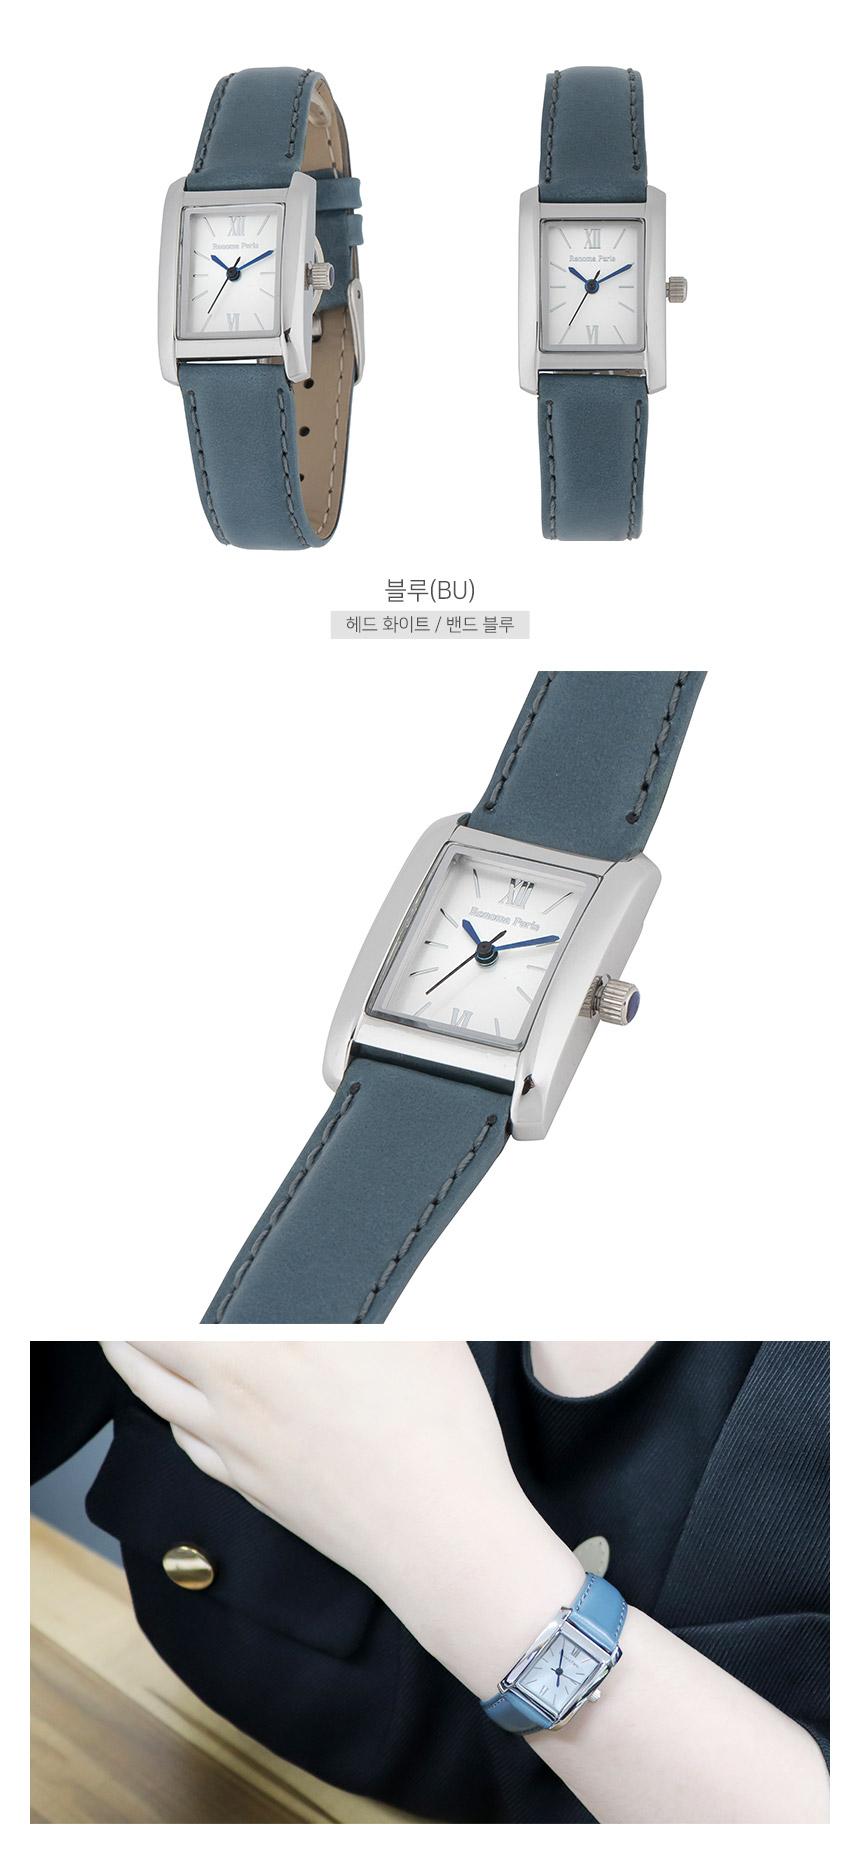 RE540 여성가죽시계/본사직영/본사AS - 란쯔, 148,000원, 여성시계, 가죽시계